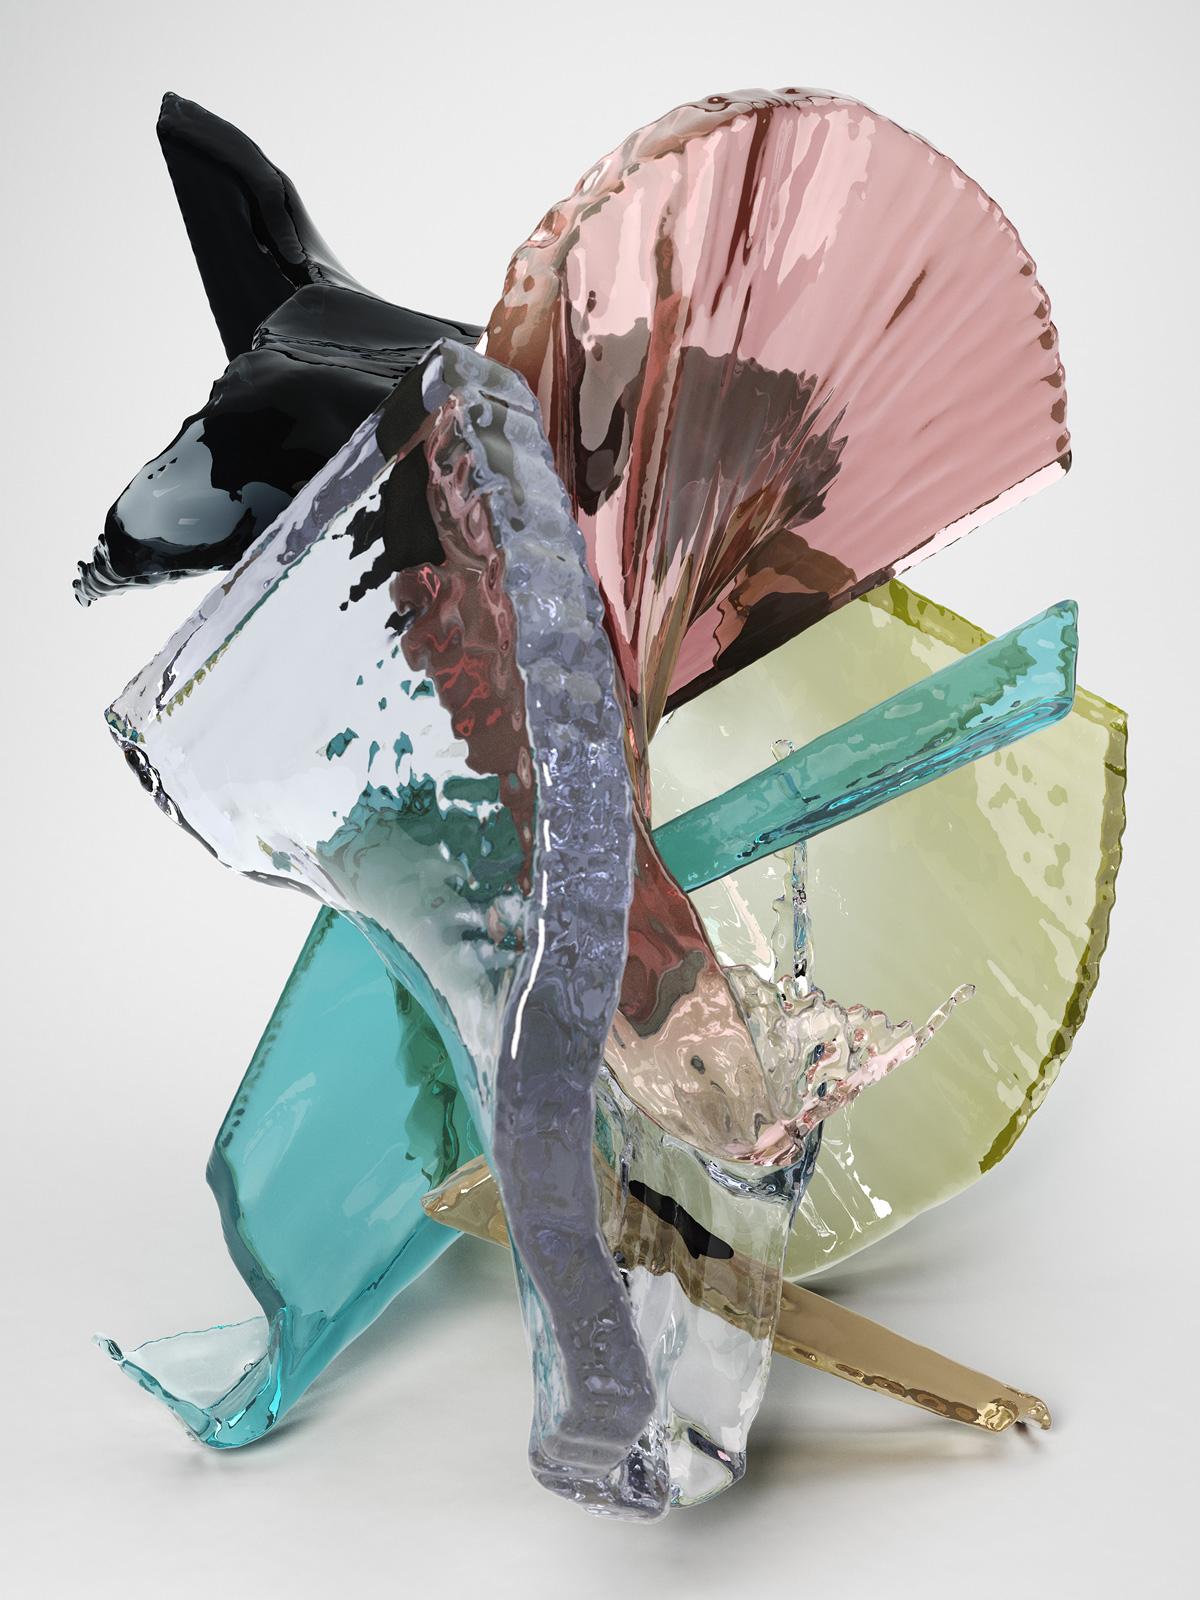 Bodypaint I 02, CGI Fine Art Print, 140 x 105 cm, 2014